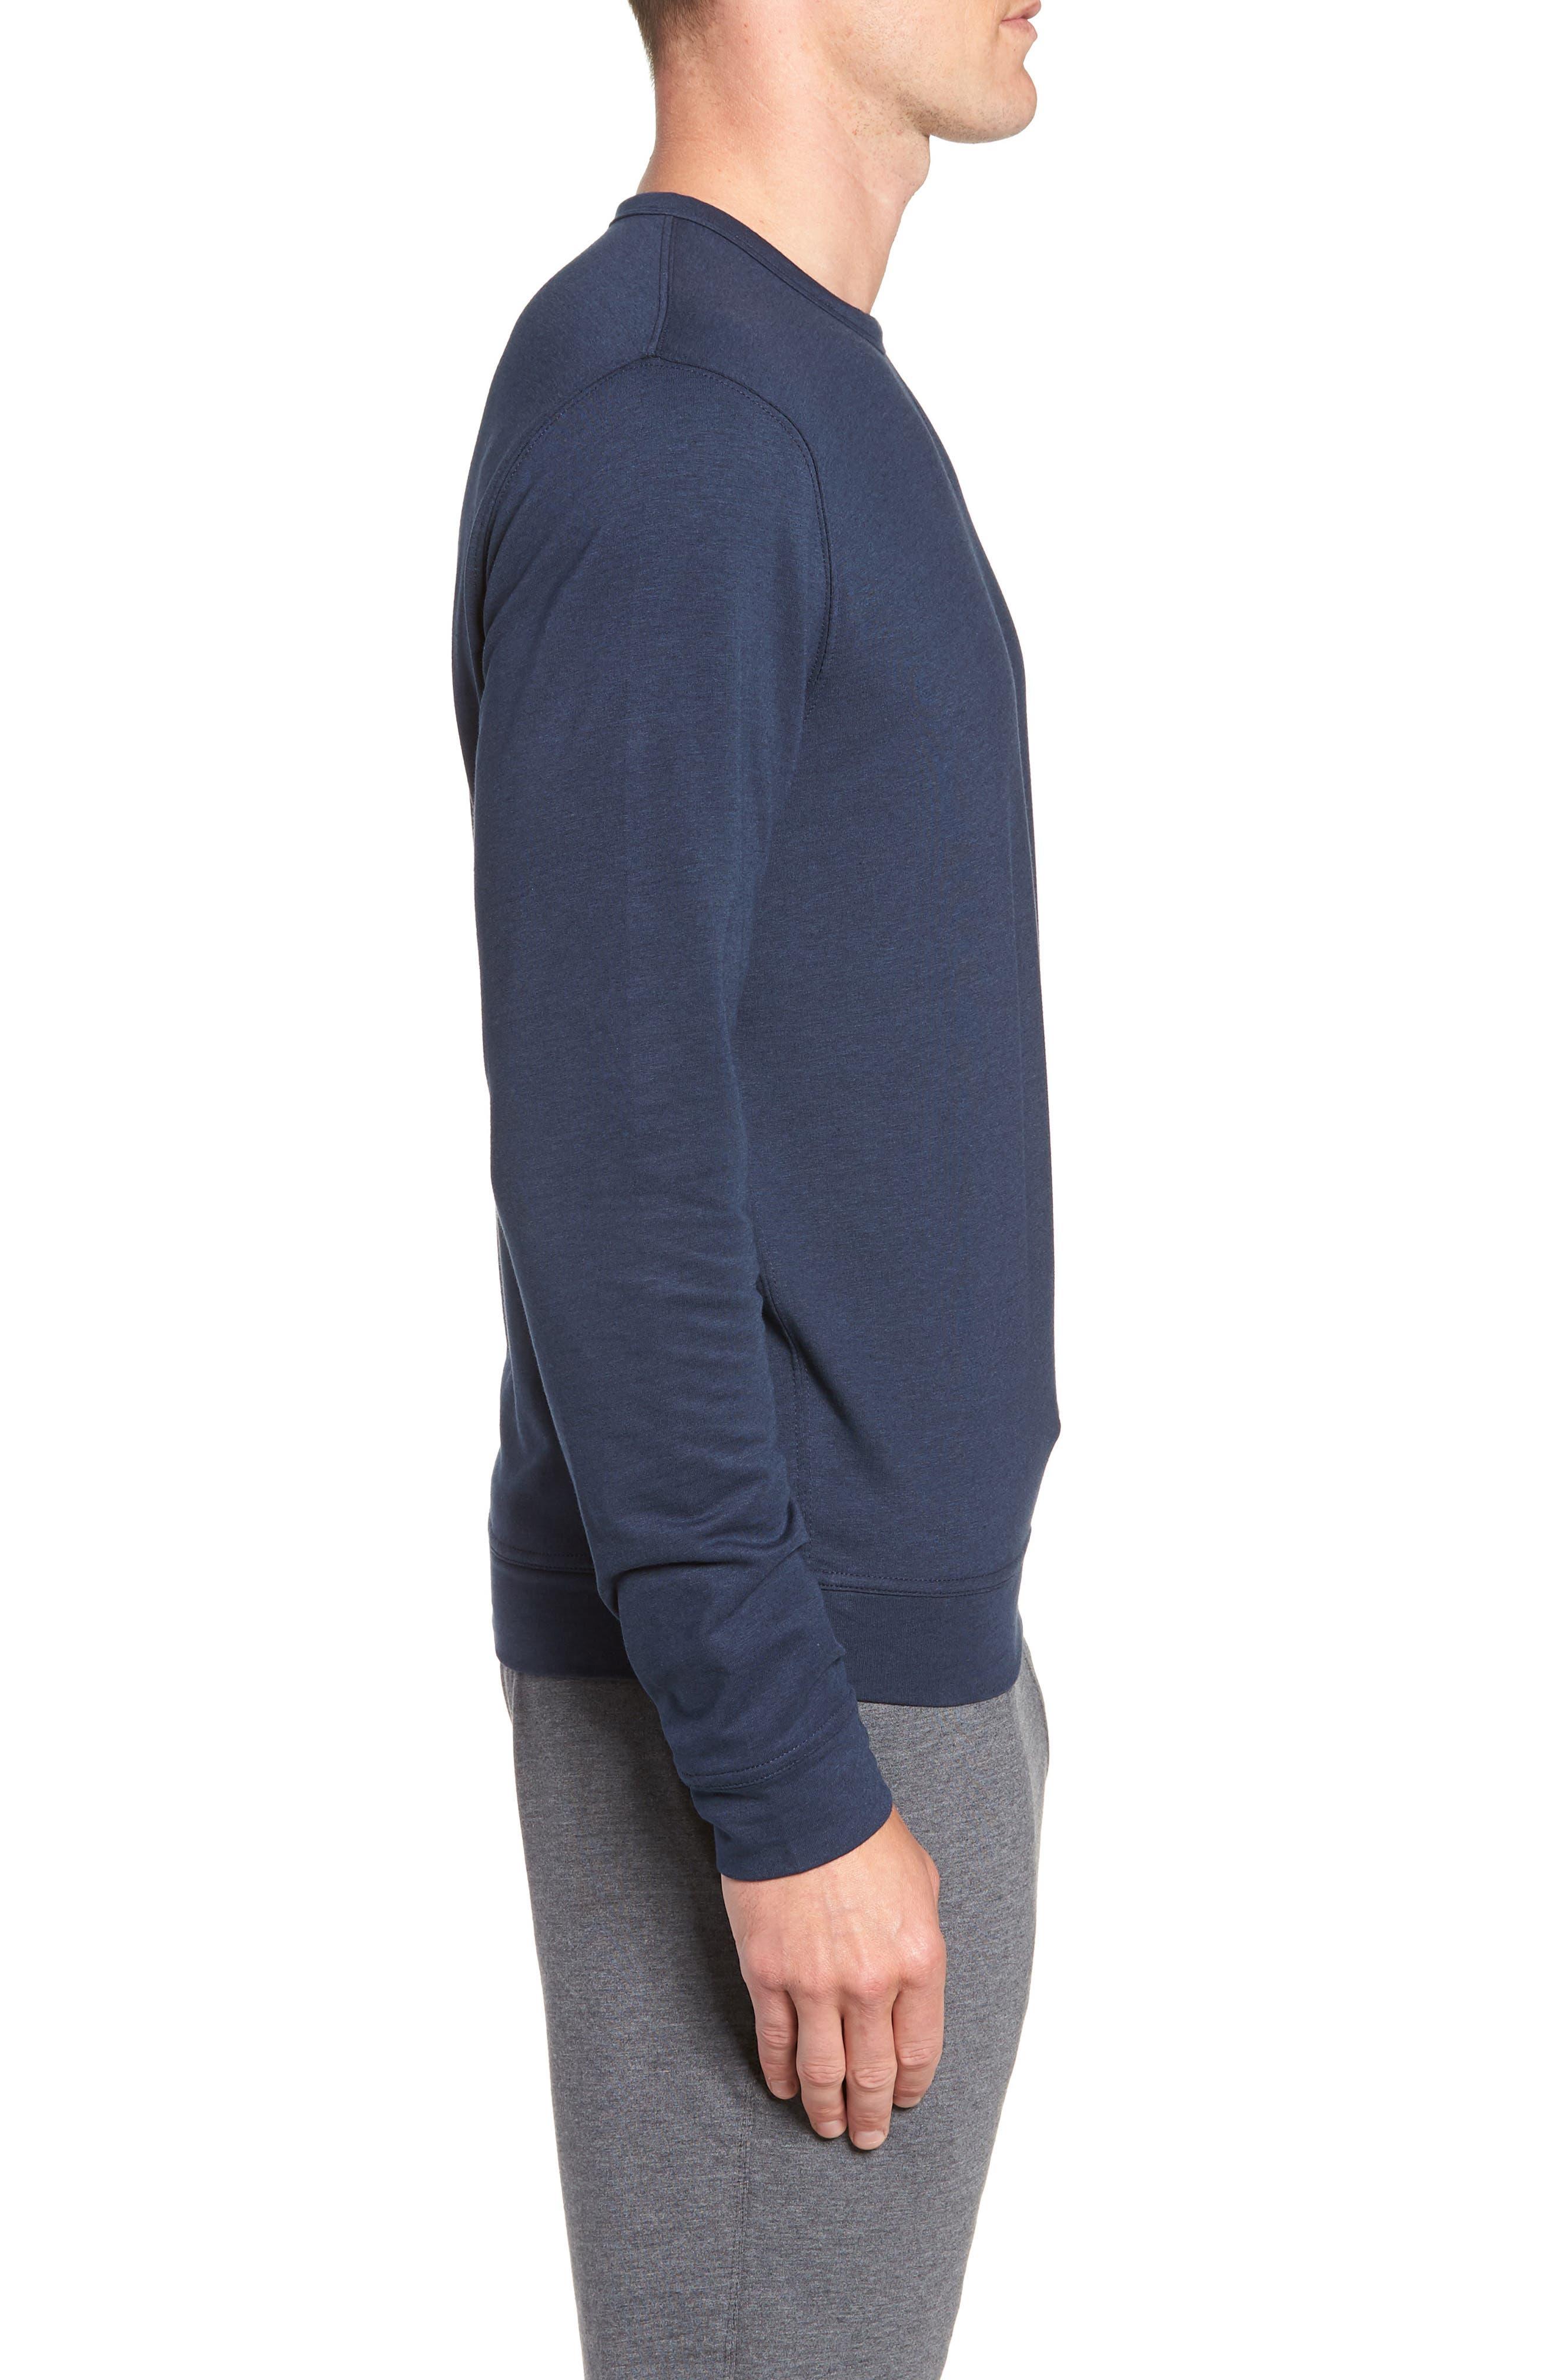 TASC PERFORMANCE, Legacy Crewneck Semi Fitted Sweatshirt, Alternate thumbnail 3, color, CLASSIC NAVY